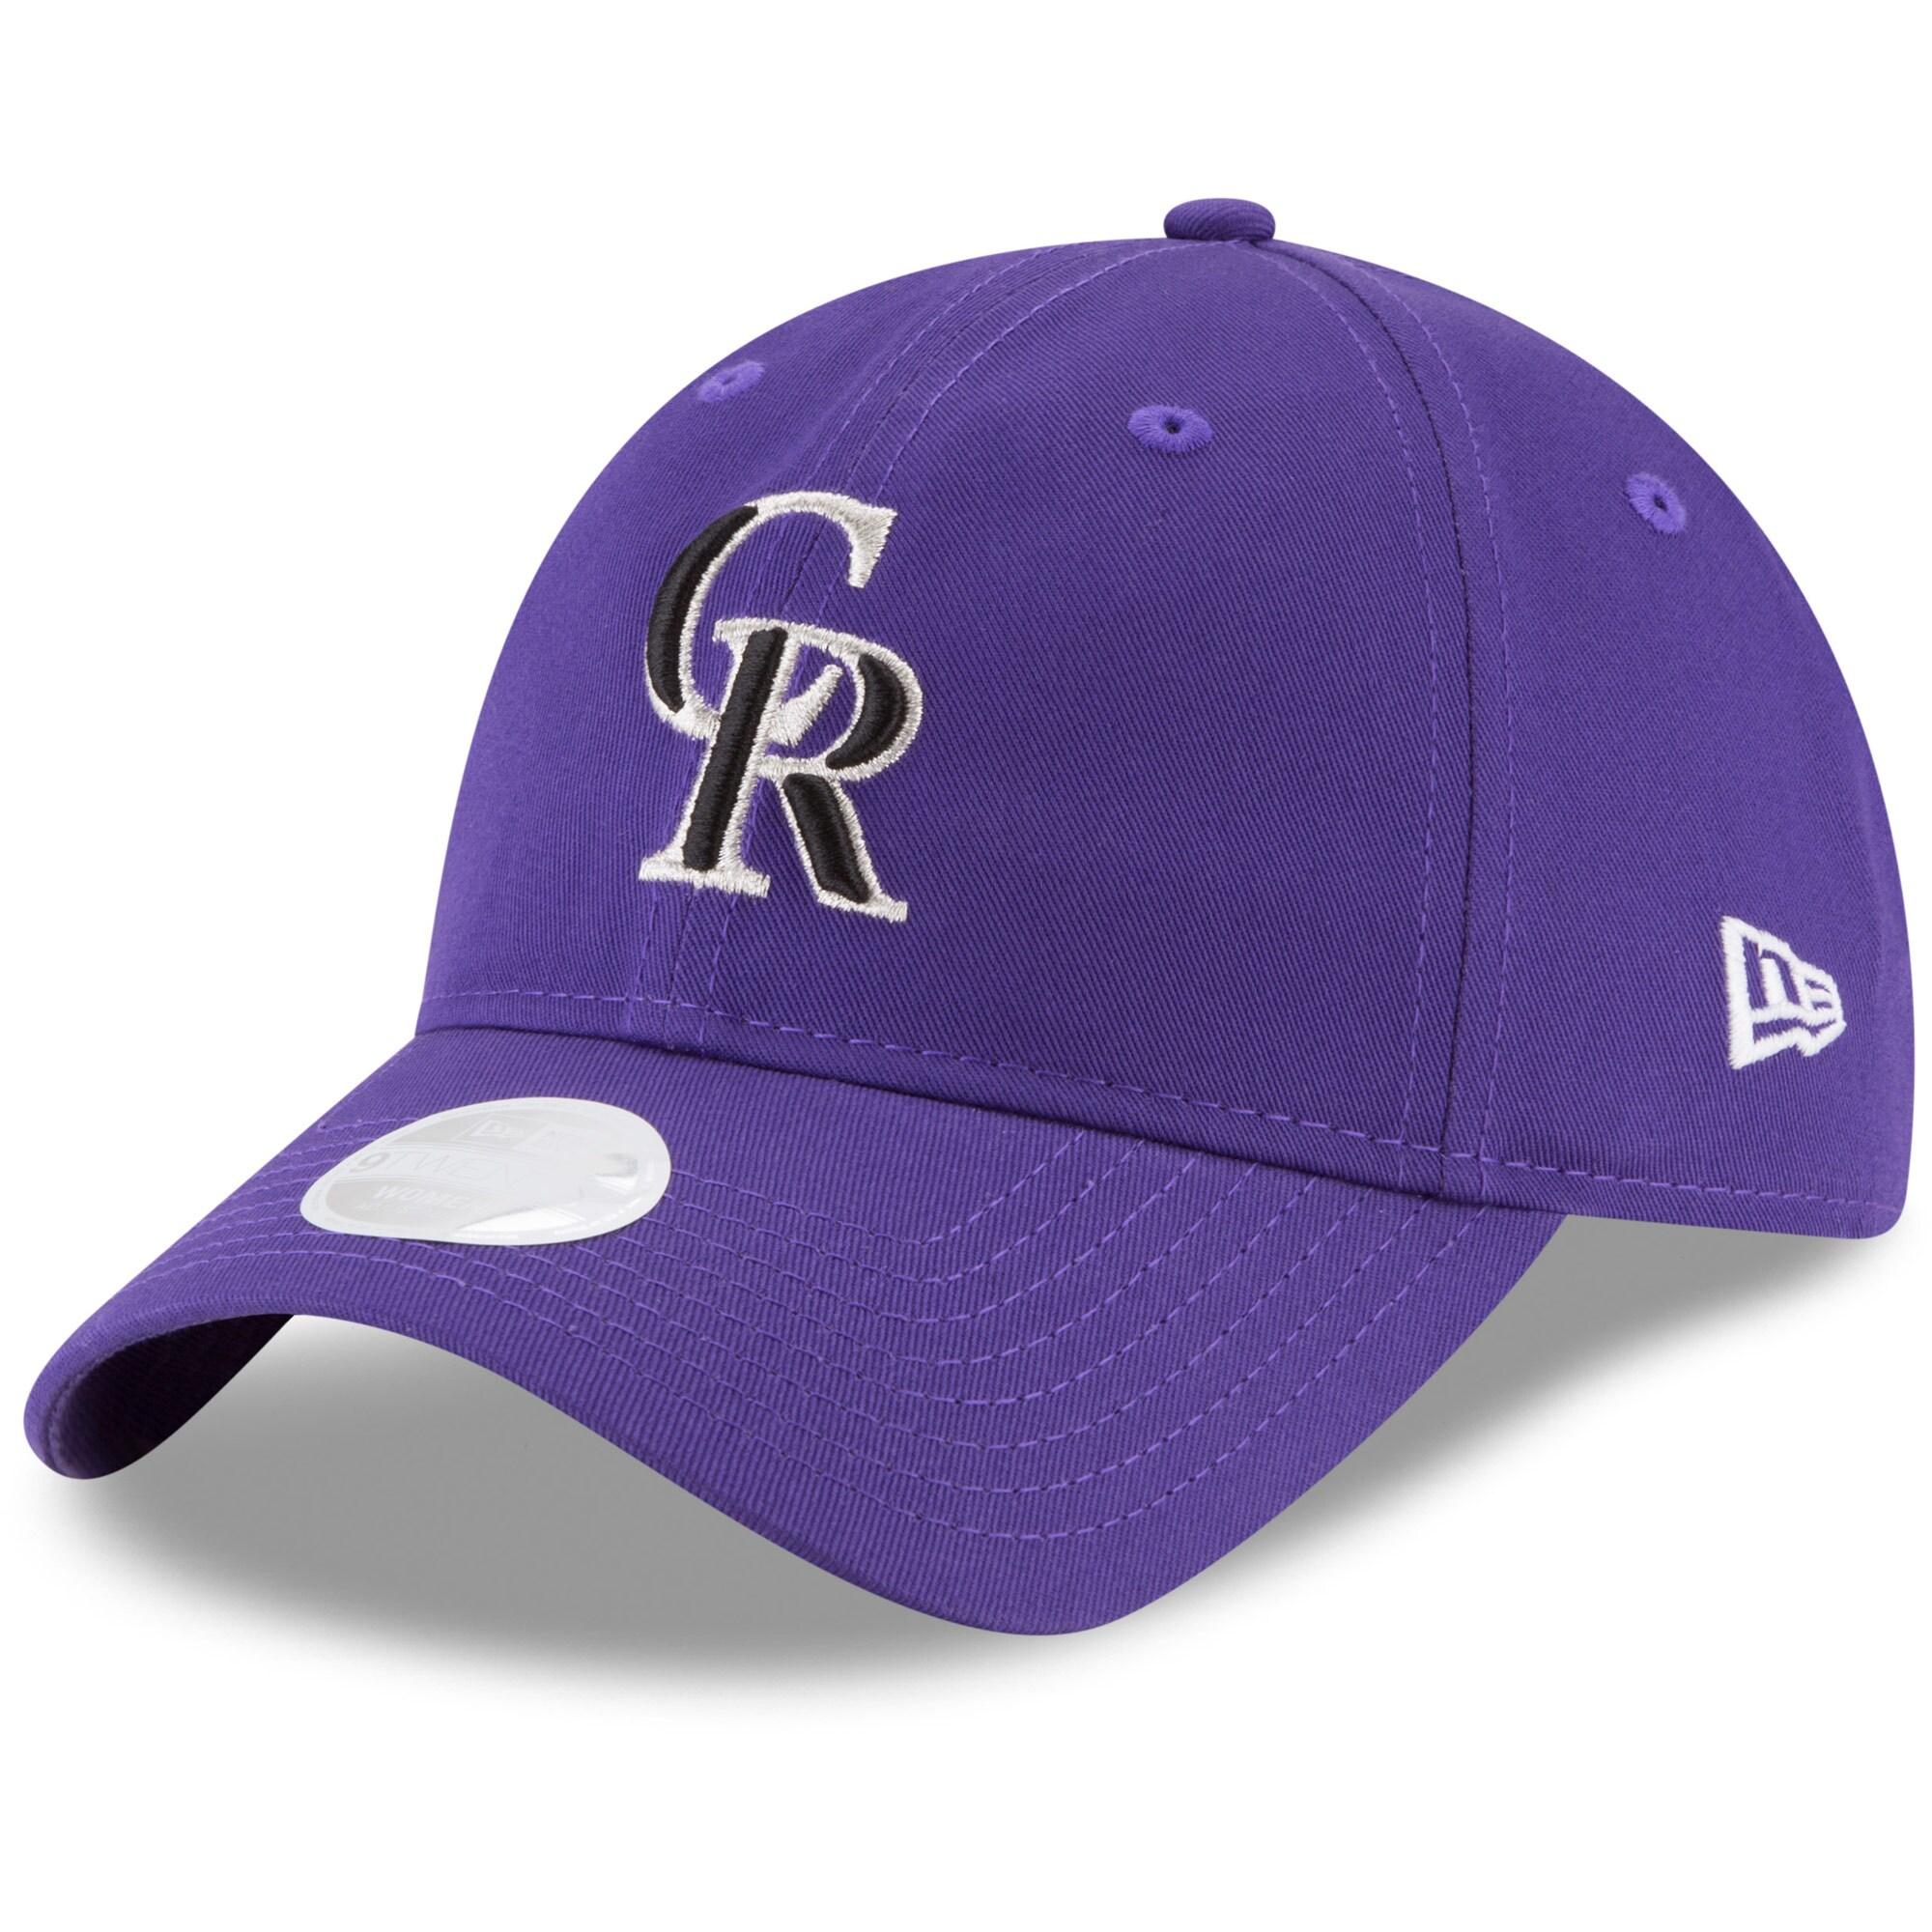 Colorado Rockies New Era Women's Core Classic 9TWENTY Adjustable Hat - Purple